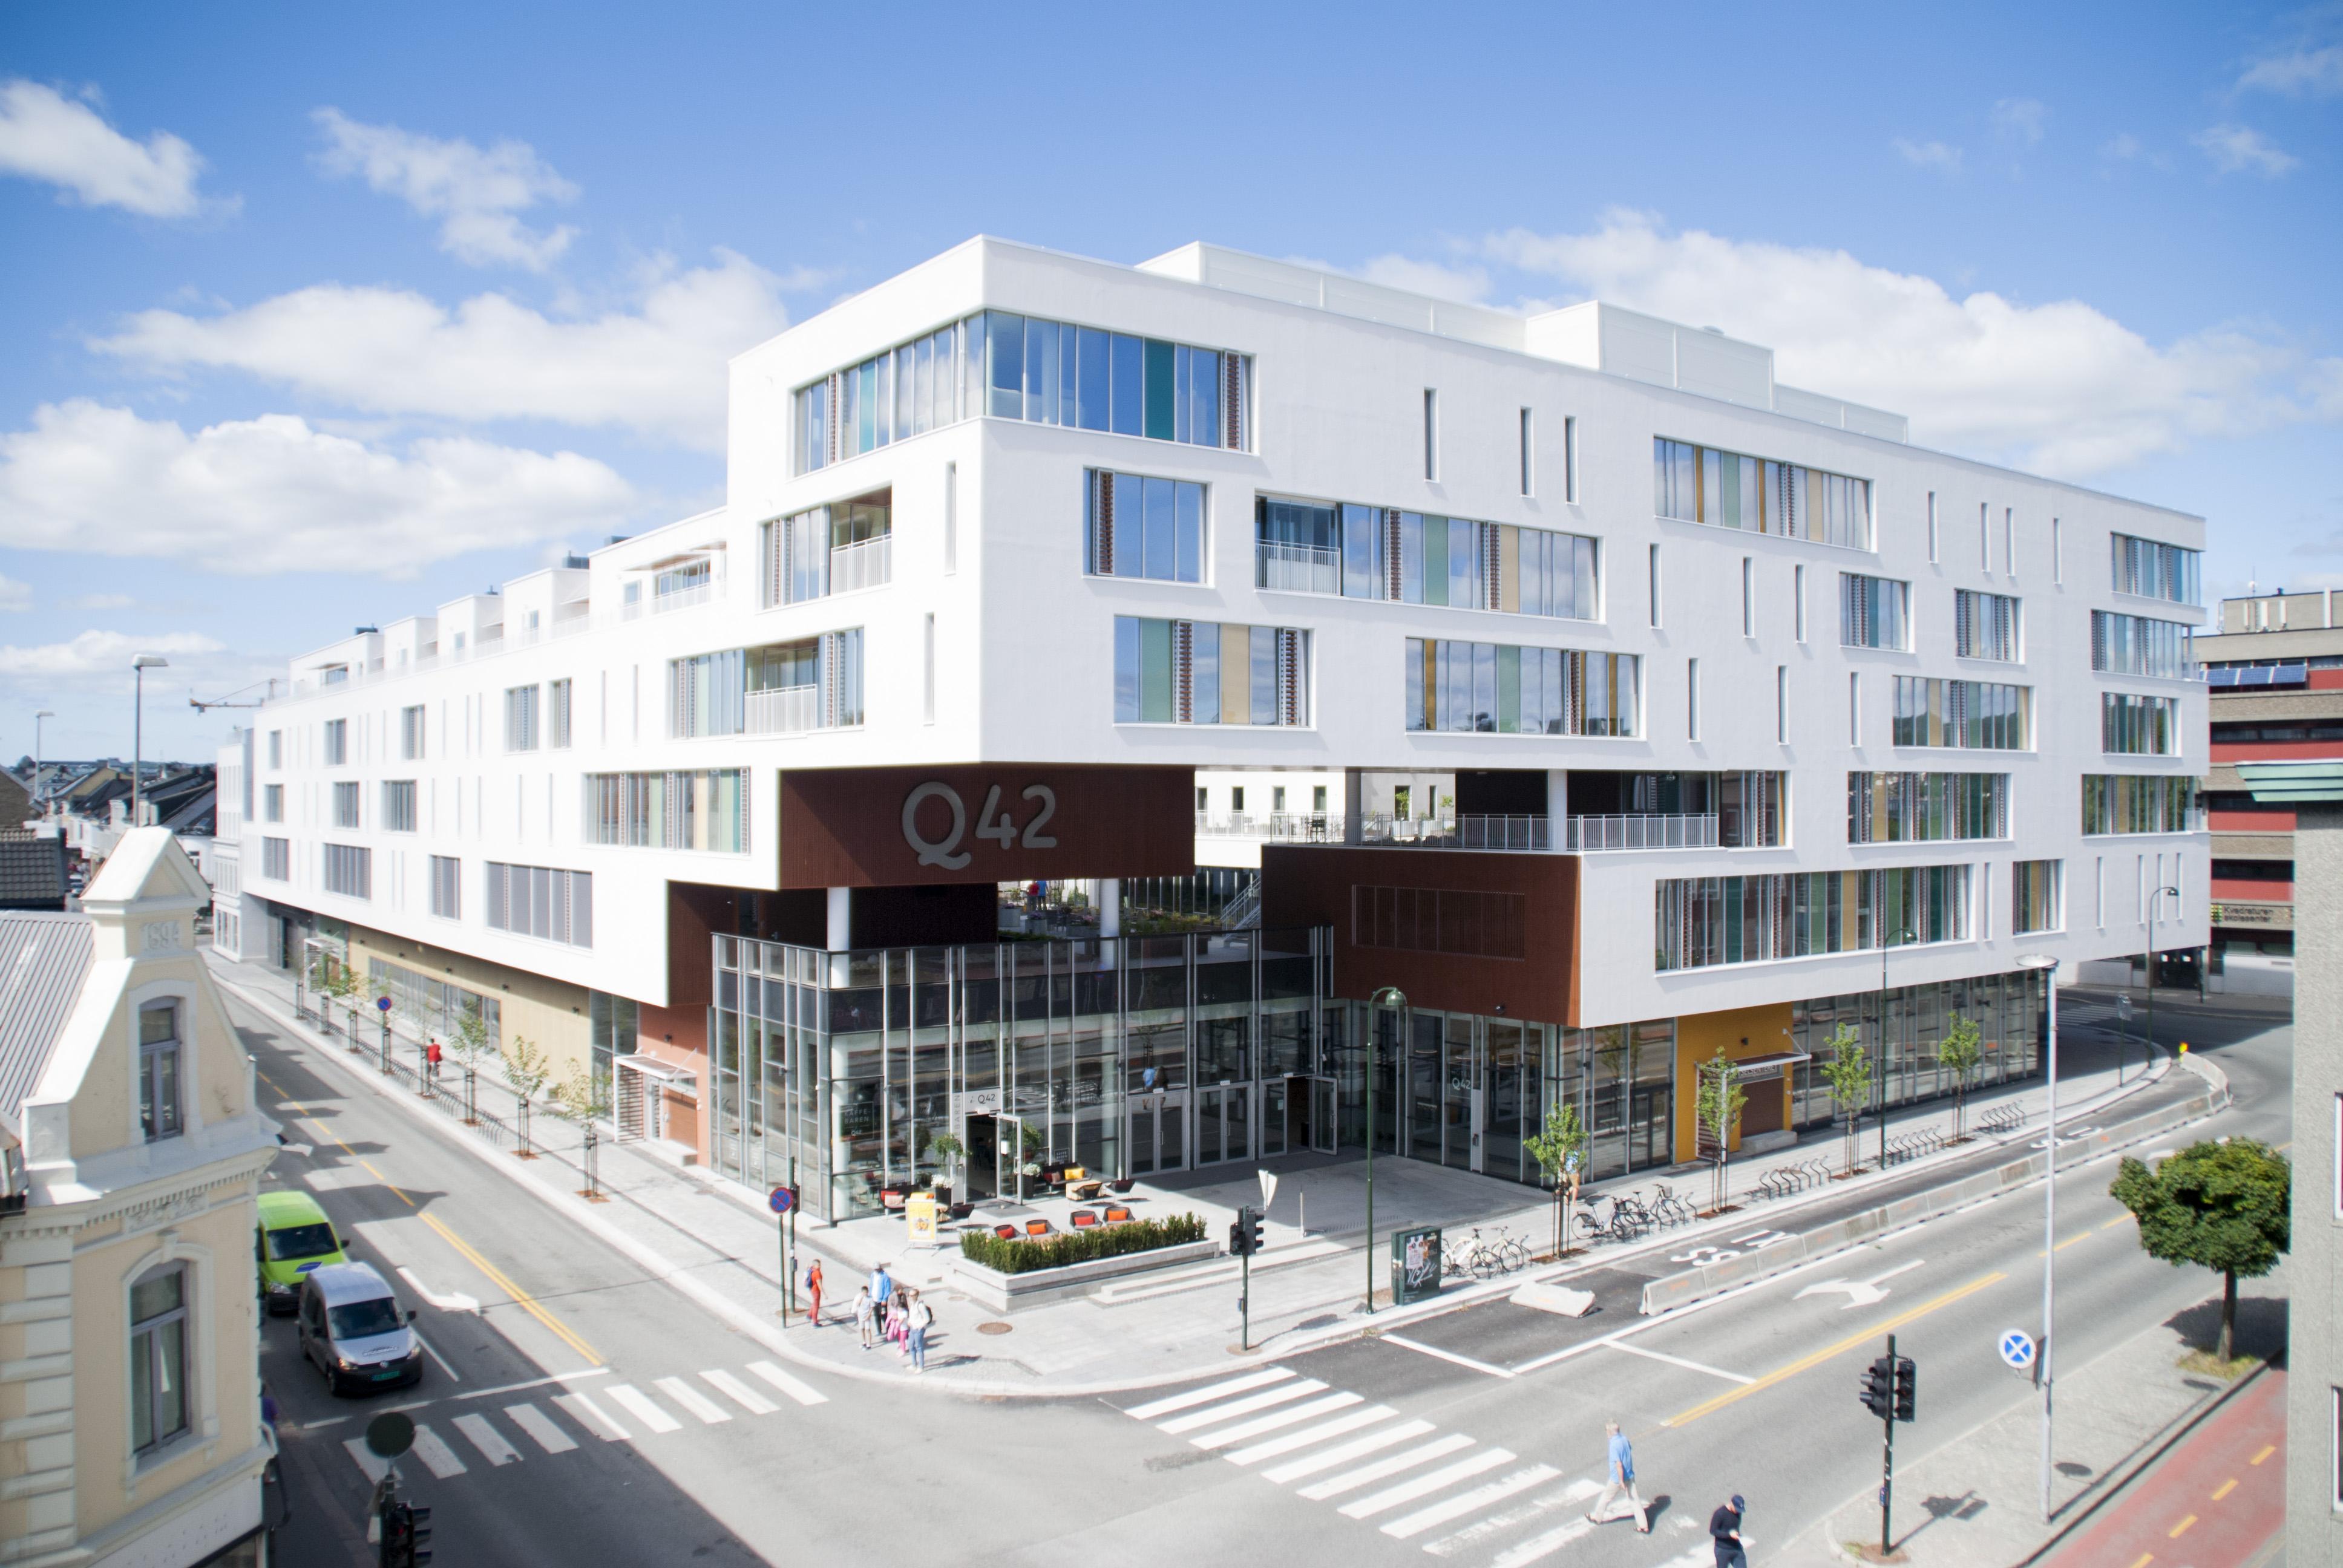 Fasade, Q42 i Kristiansand